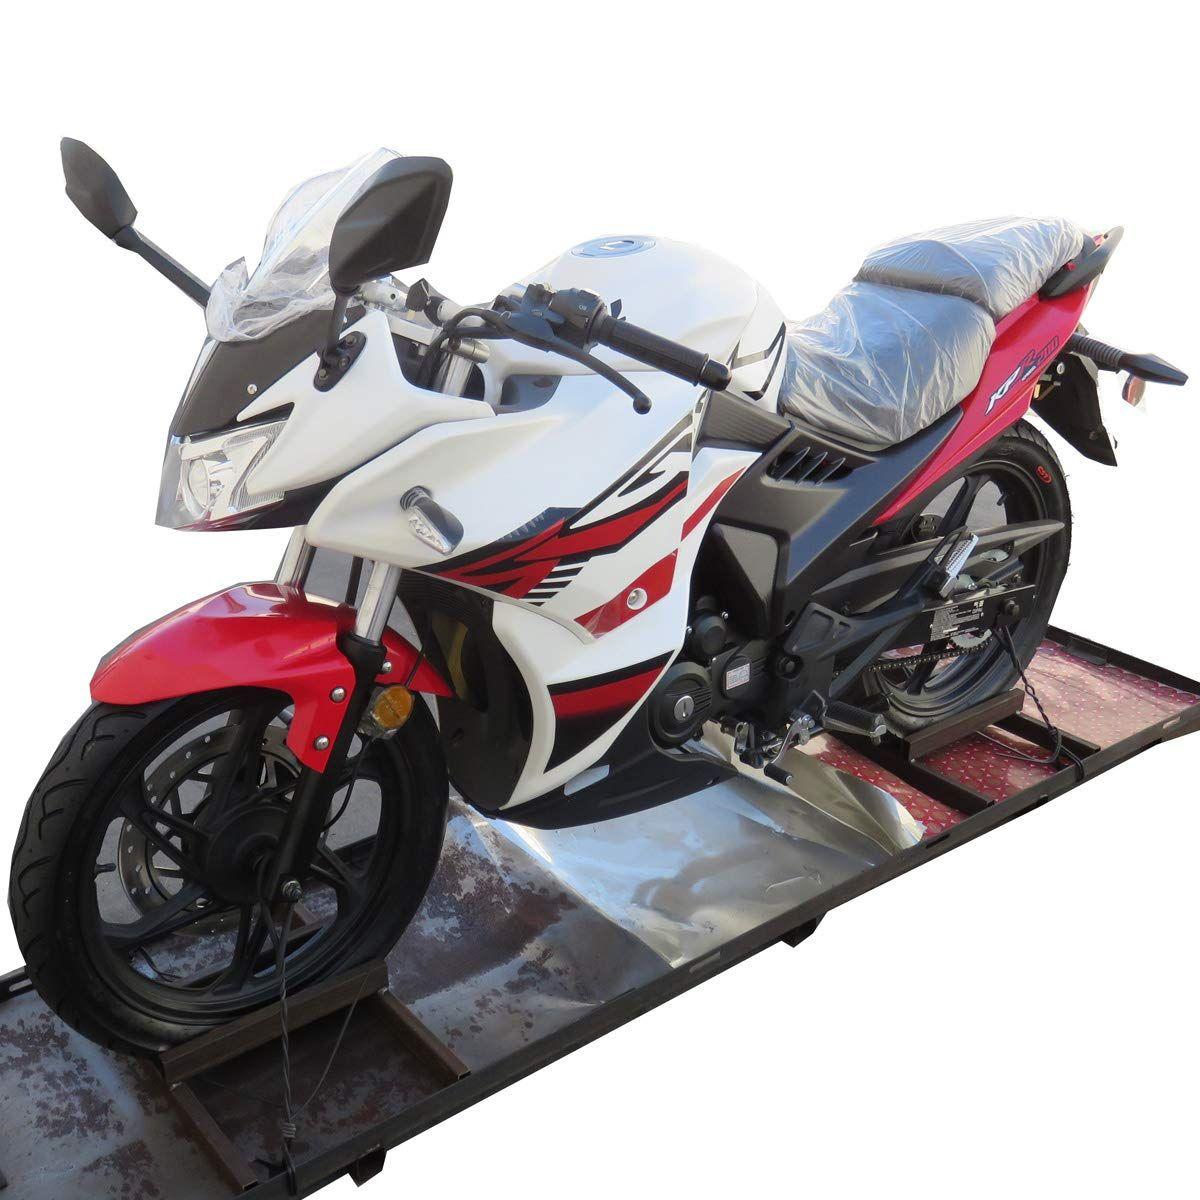 X-Pro 200cc Motorcycle Bike Adult Dirt Bike 200cc Street Bike Dirt Bikes